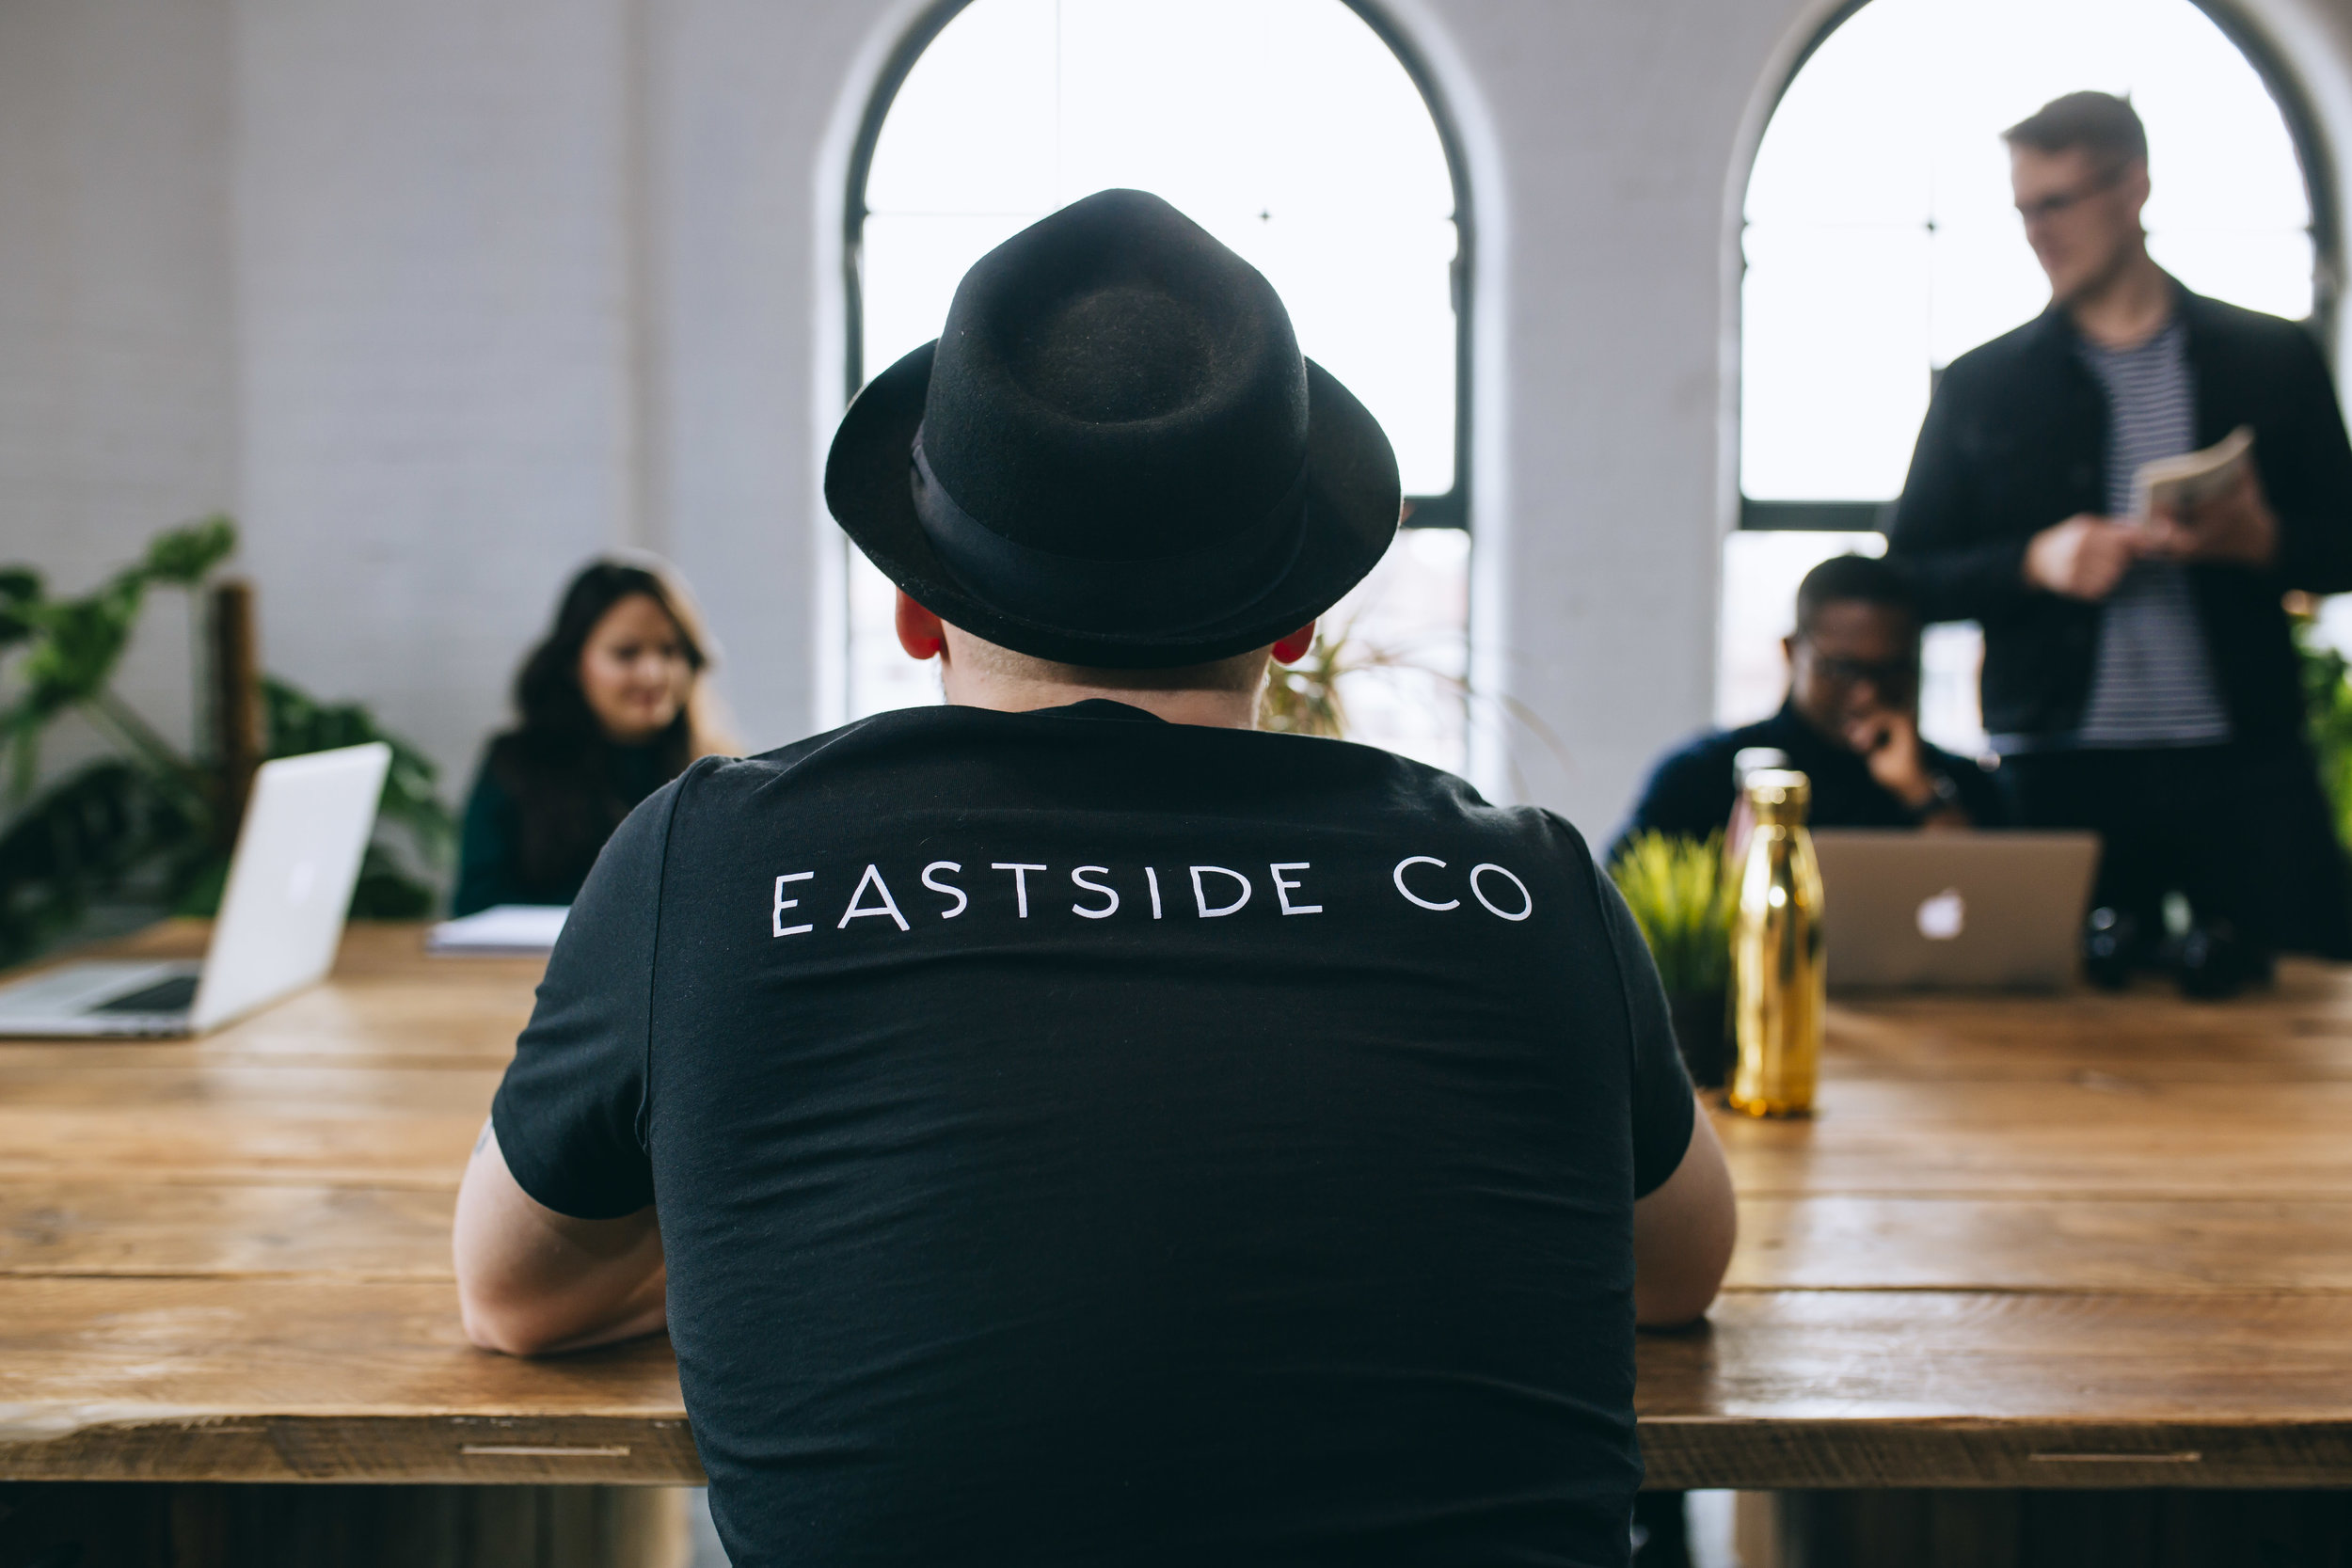 Eastside Lifestyle _ brand commercial photography rebrand birmingham photographer digbeth Eastside co-11.jpg